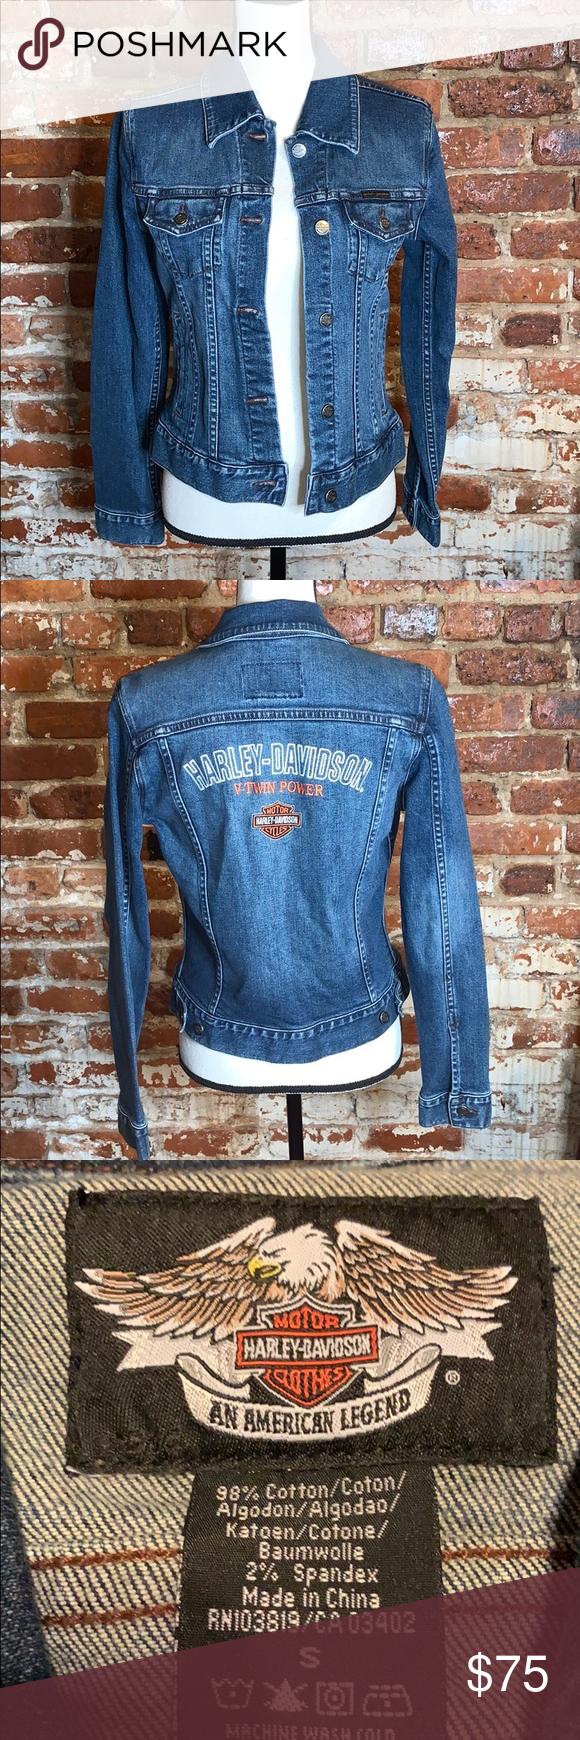 Harley Davidson Jean Jacket Uss Harley Davidson Jean Jacket Harley Davidson Jeans Clothes Design [ 1740 x 580 Pixel ]